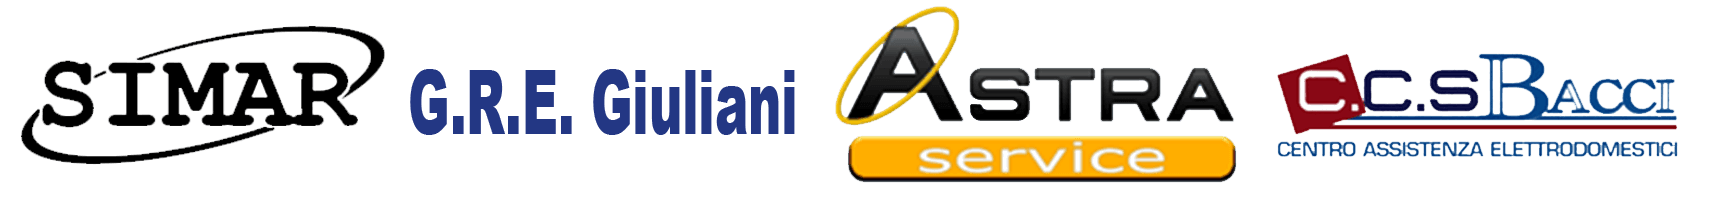 LOGHI - SIMAR - G.R.A GIULIANI - ASTRA SERVICE - C.C.S. BACCI